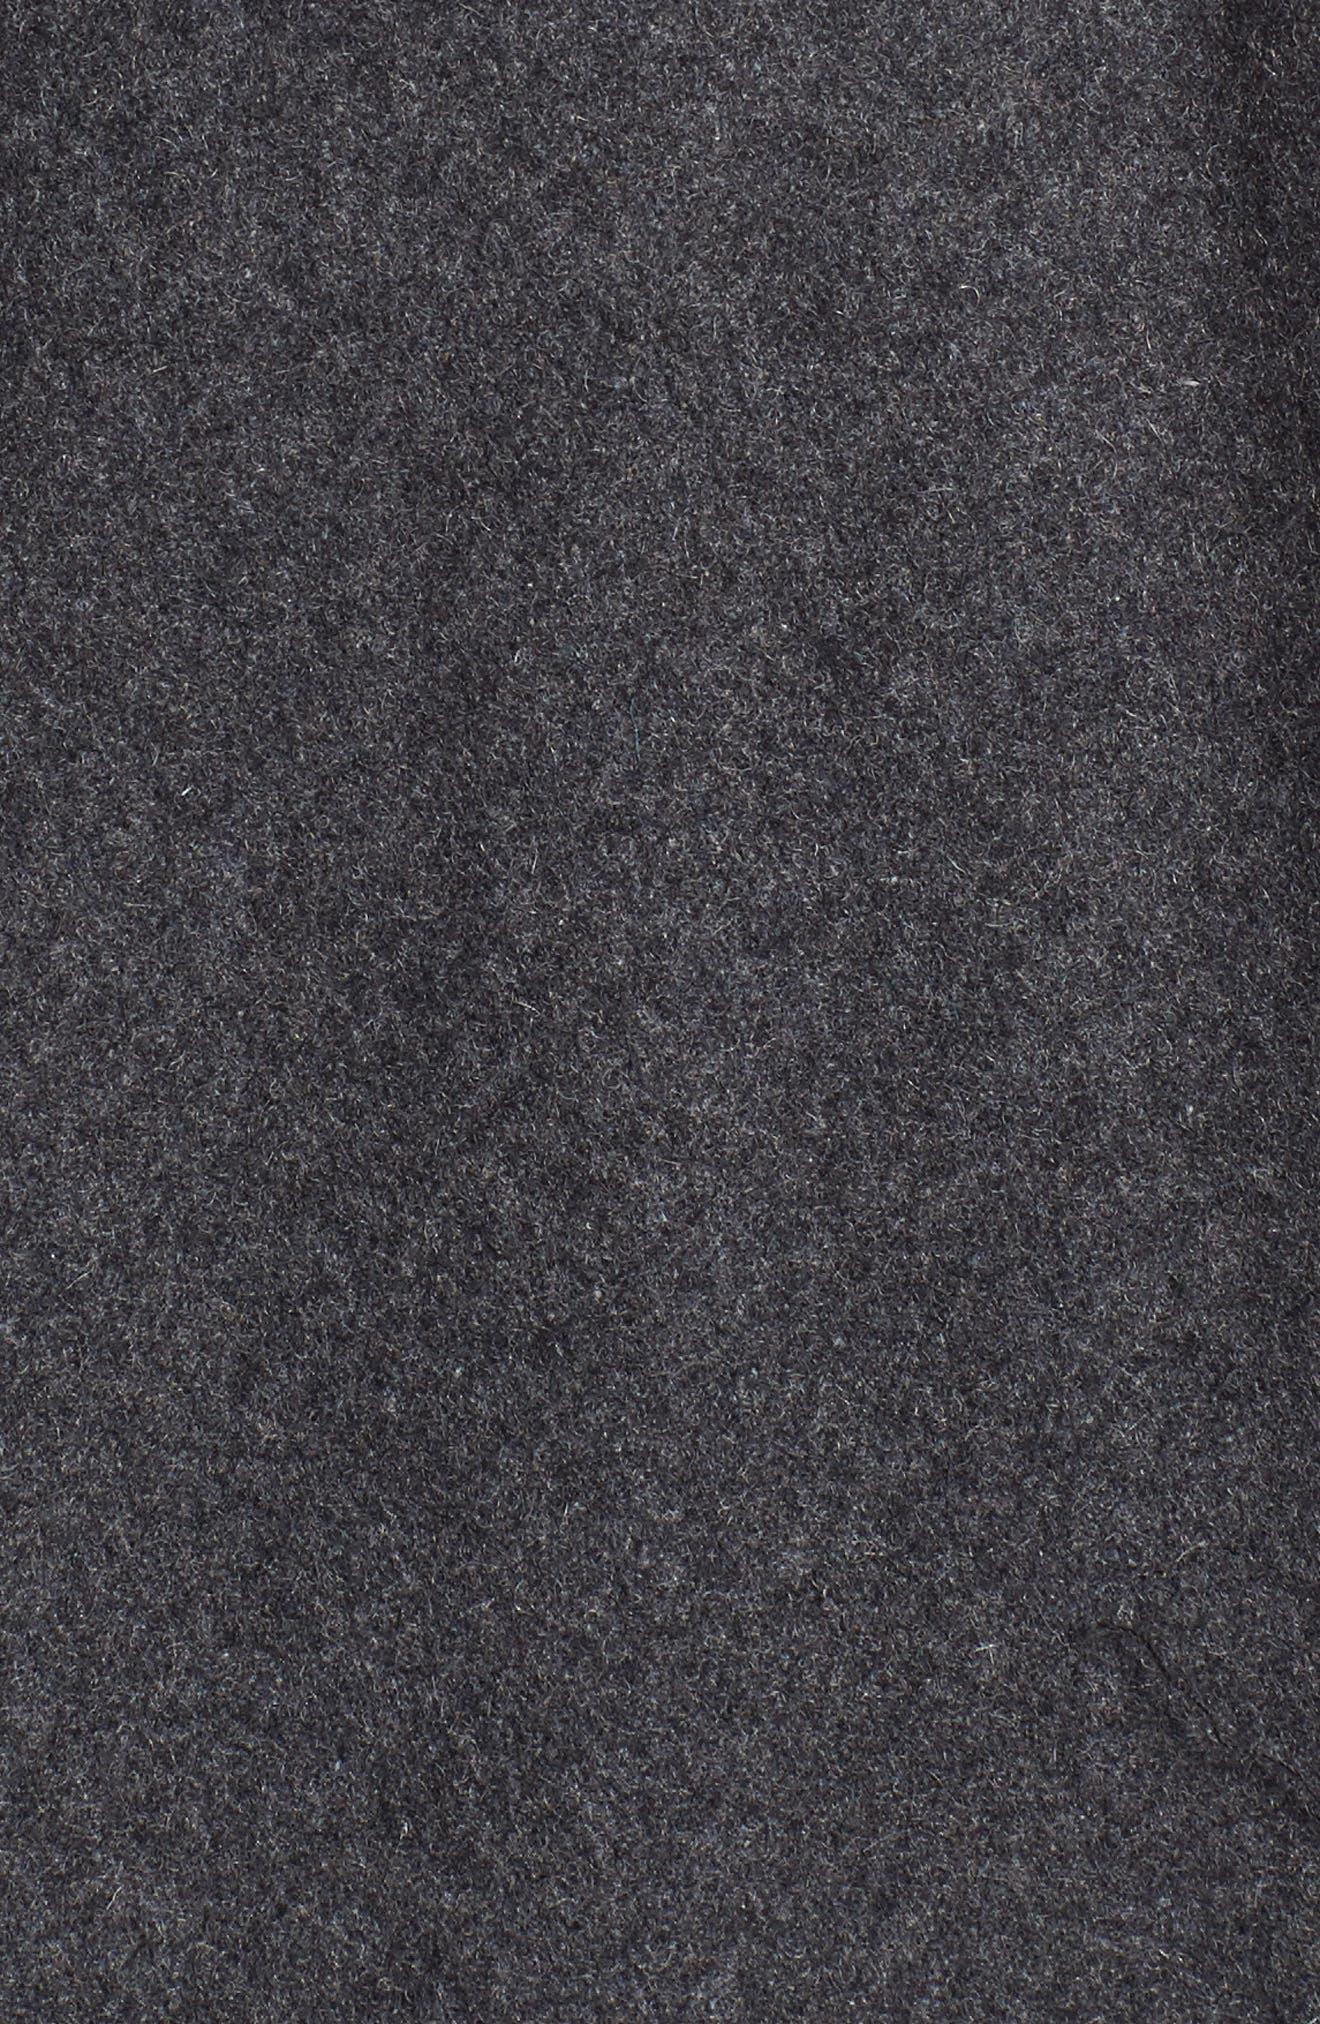 Burnett Wool Blend Peacoat with Front Insert,                             Alternate thumbnail 5, color,                             Charcoal